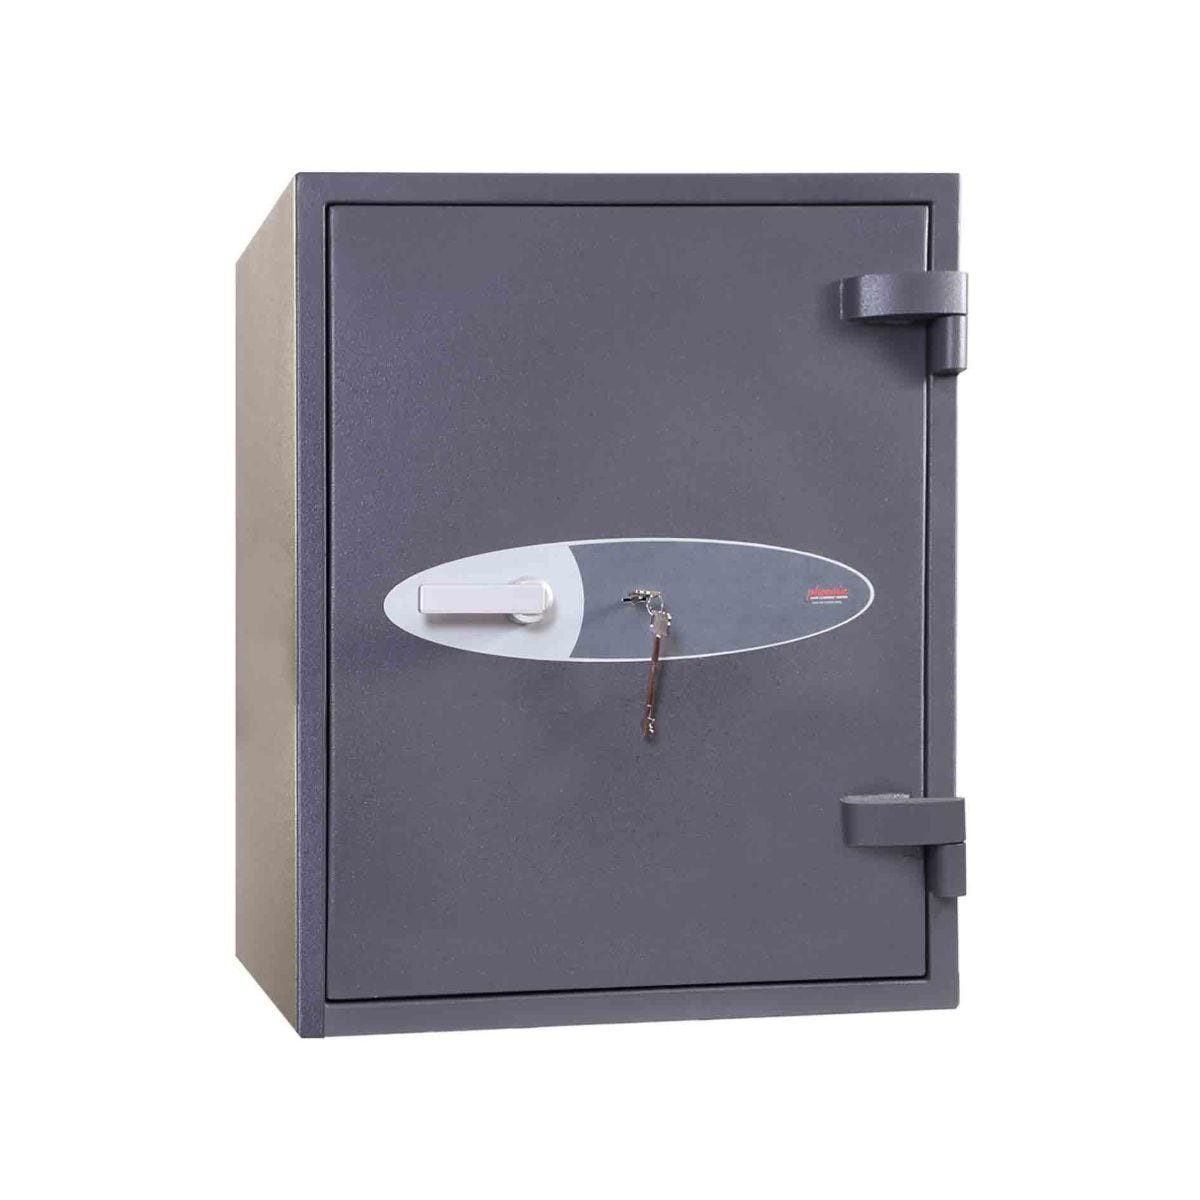 Phoenix Neptune HS1054K High Security Euro Grade 1 Safe with Key Lock Size 4